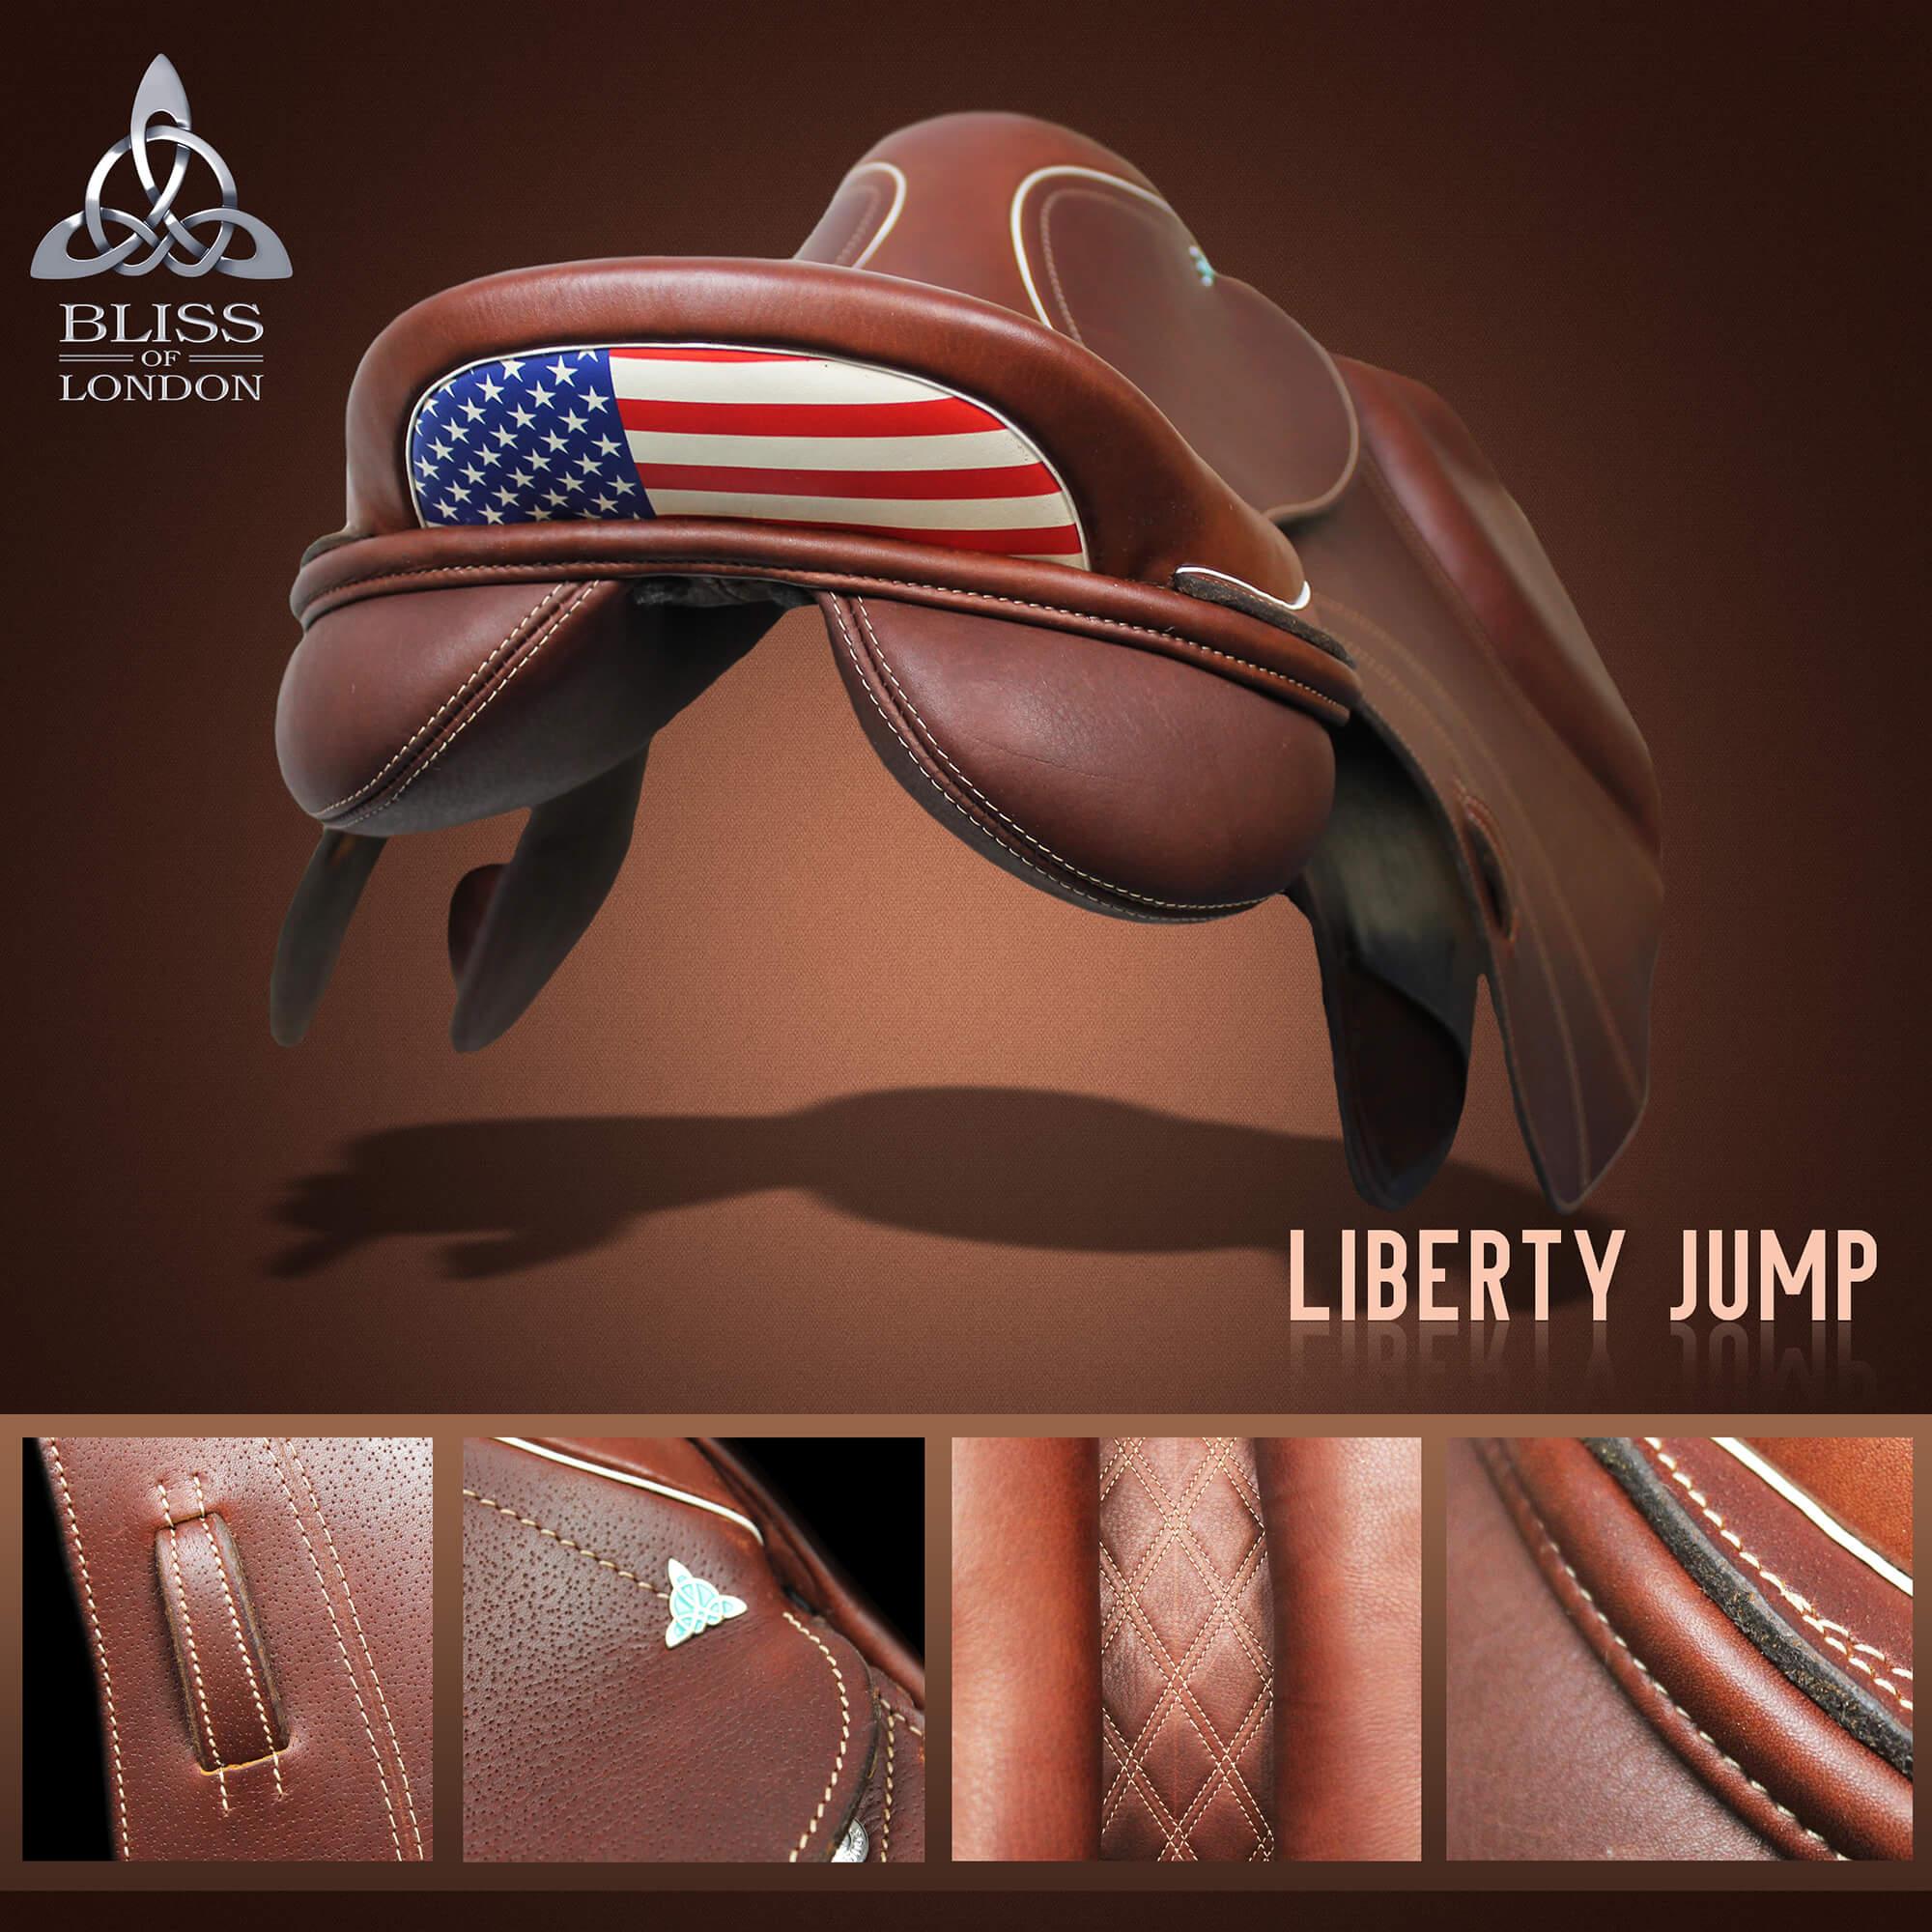 4-Bliss-Liberty-Jump-claret-USA-